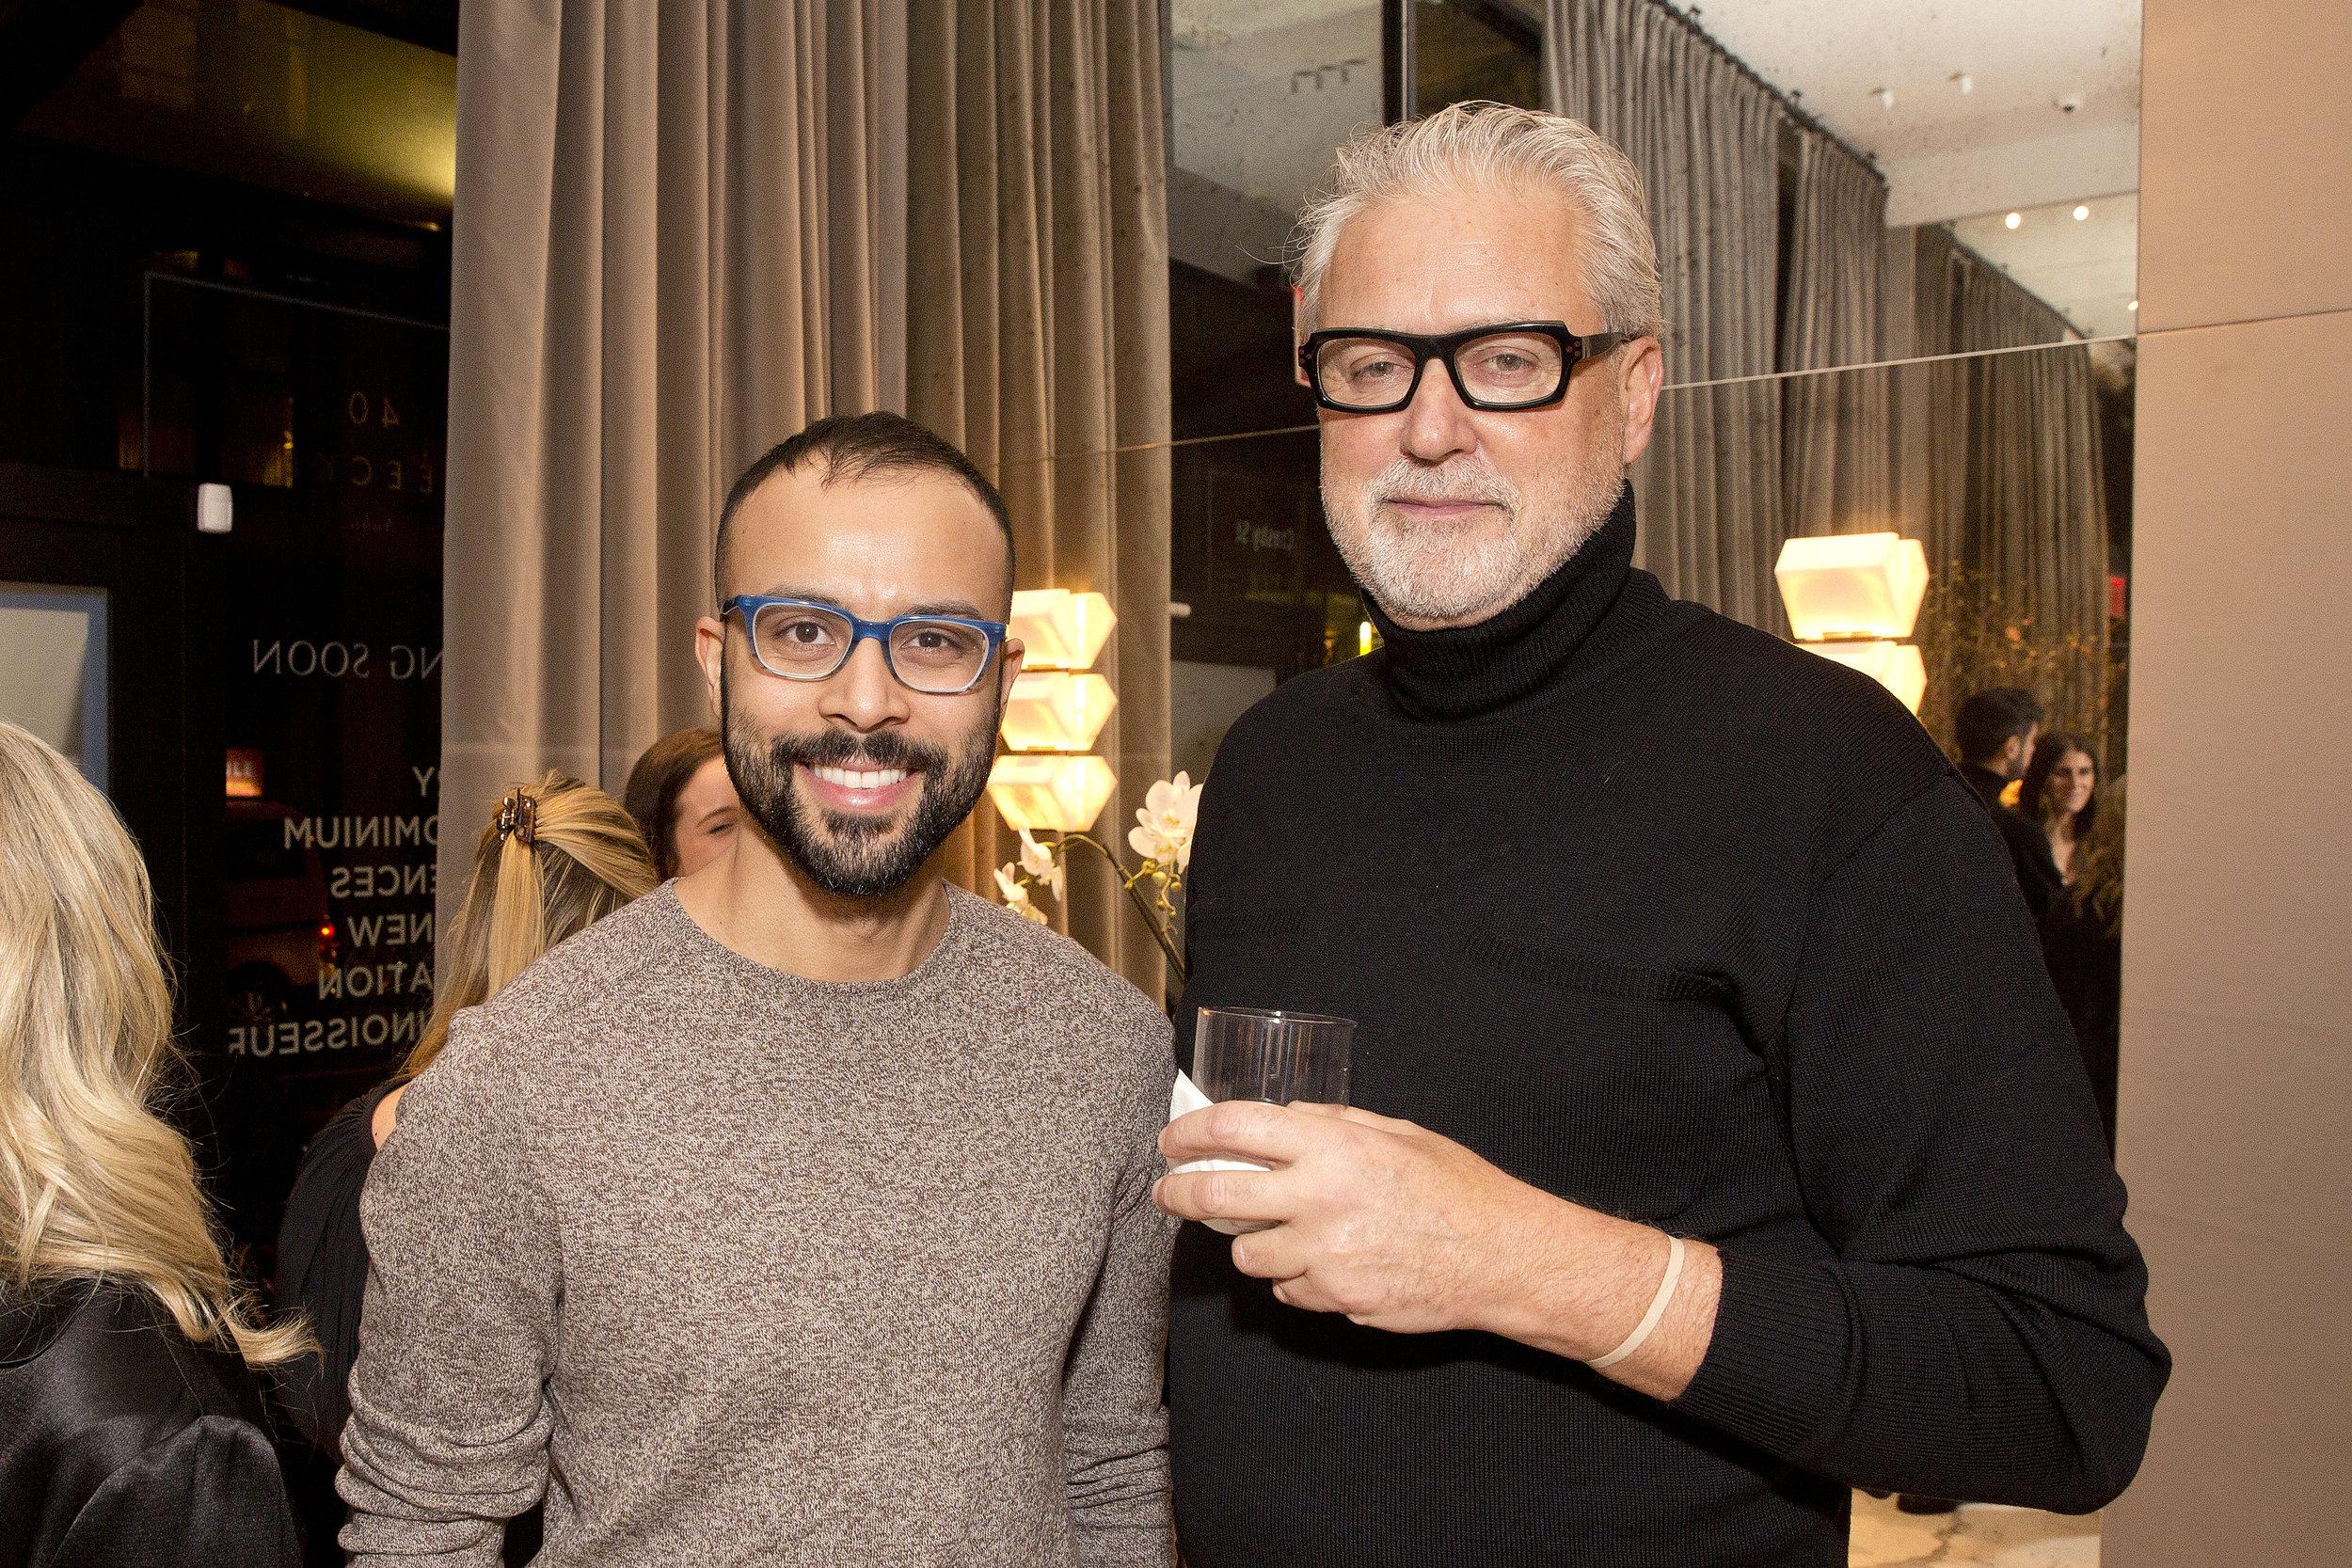 Million Dollar Listing's Fredrik Eklund and AD100's Ryan Korban Celebrate The Launch of Sales at 40 Bleecker